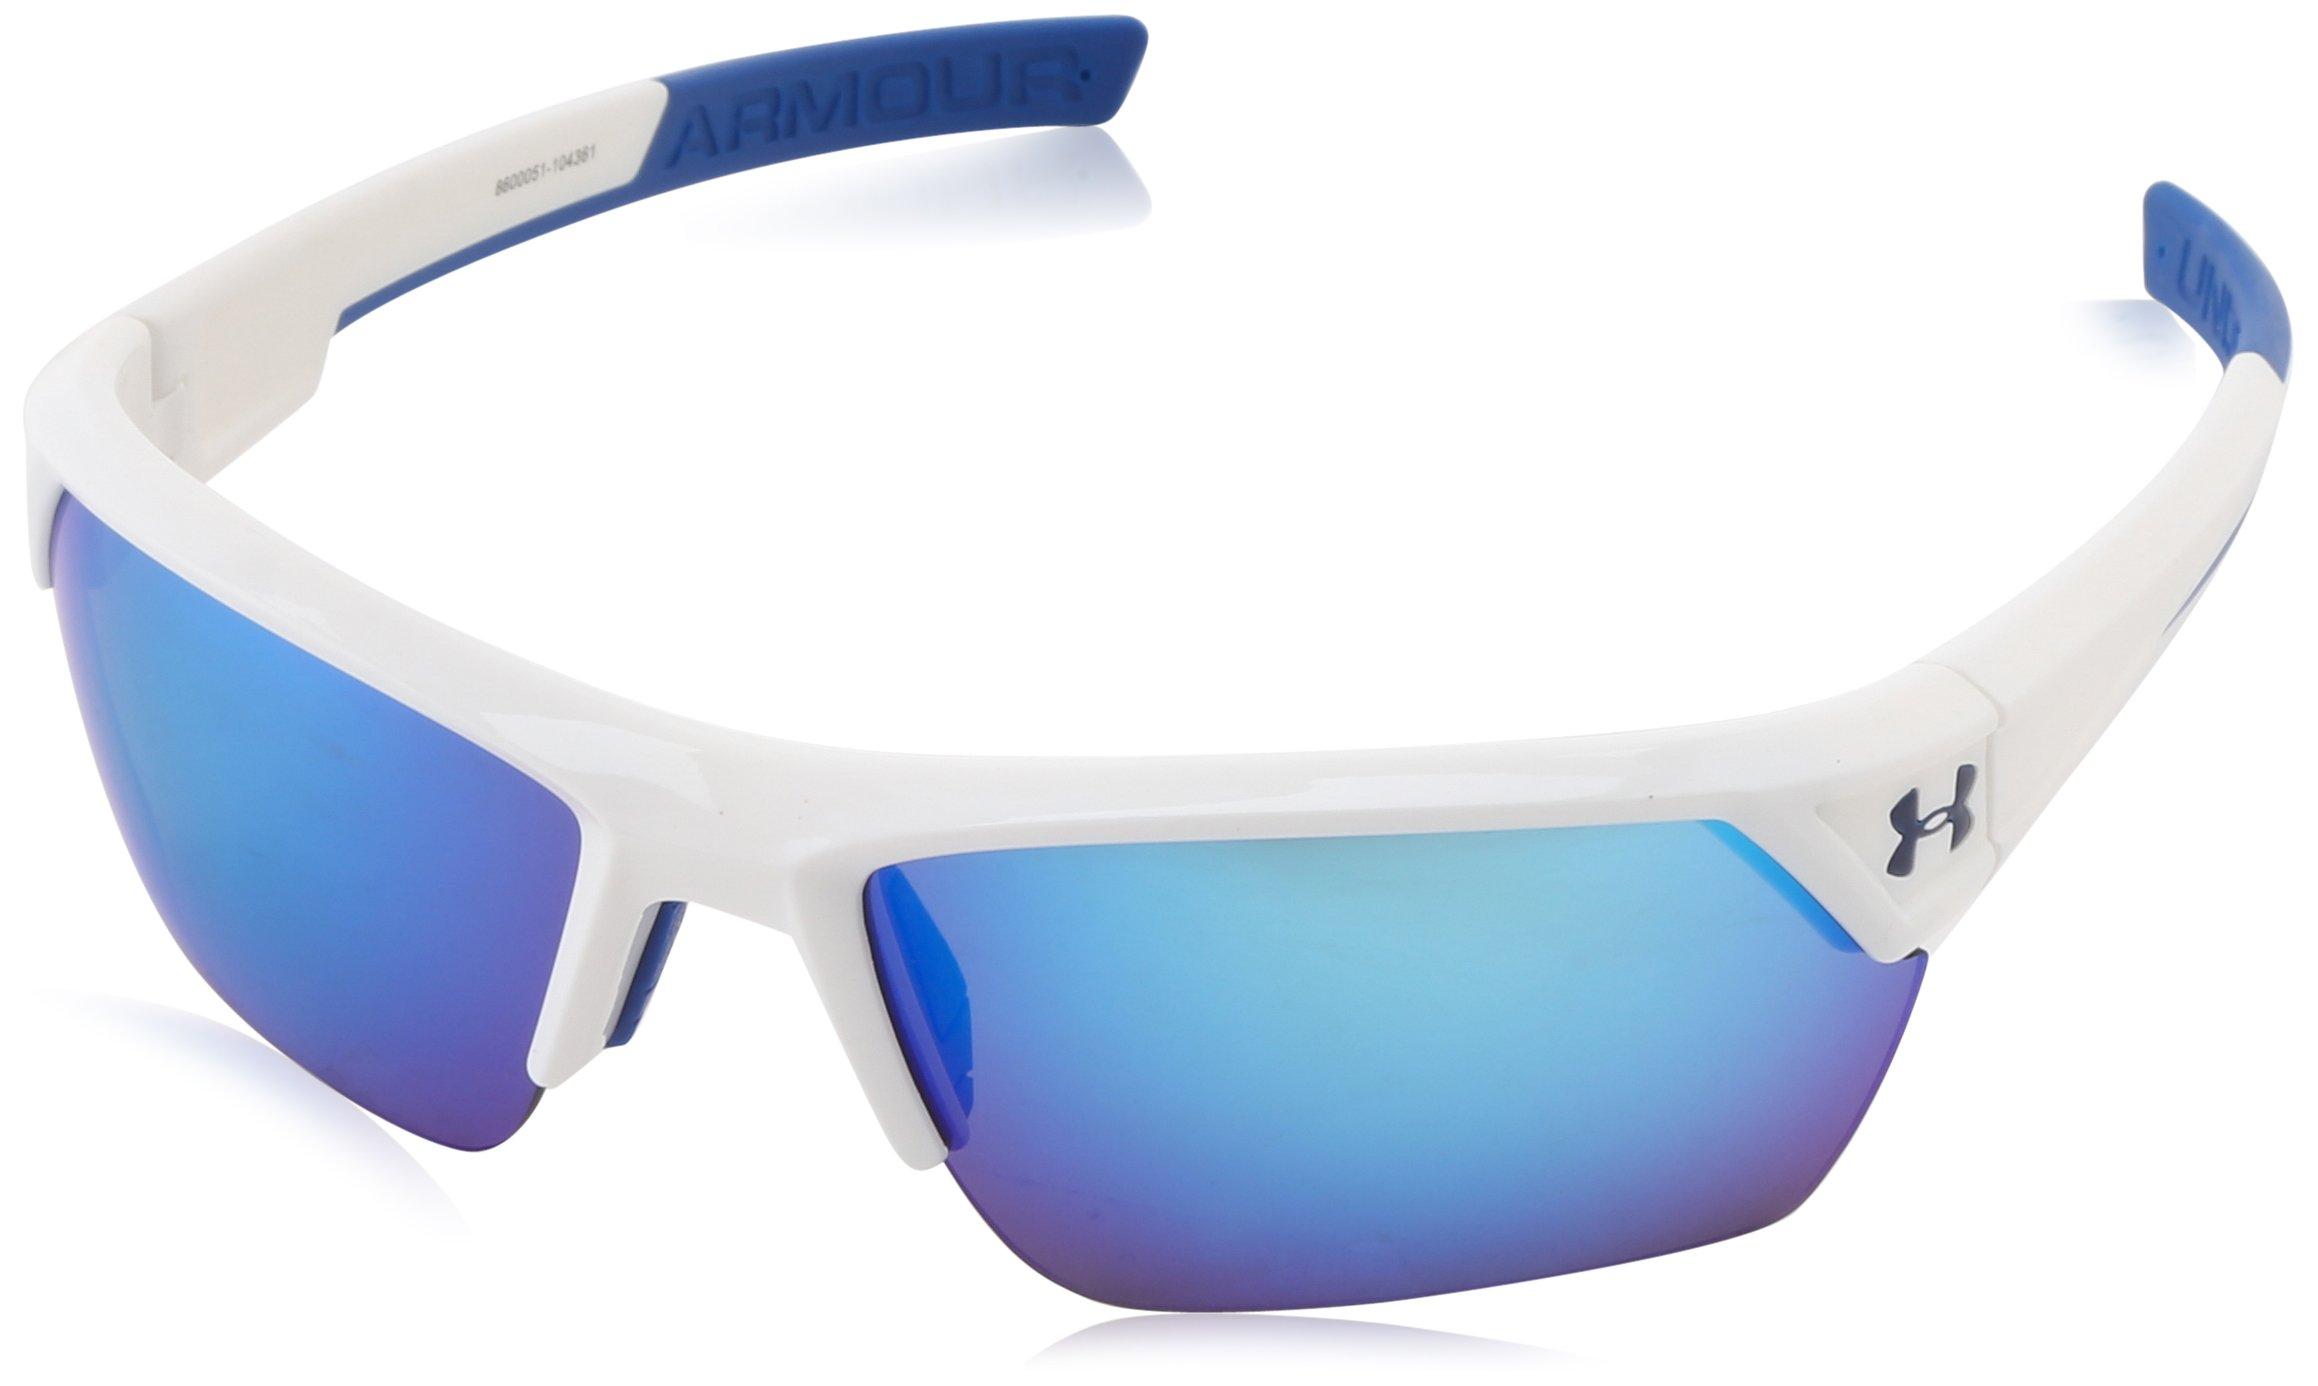 Under Armour Igniter II Shiny White Frame w/ Blue Mirror Lens Sunglasses 8600051-104361